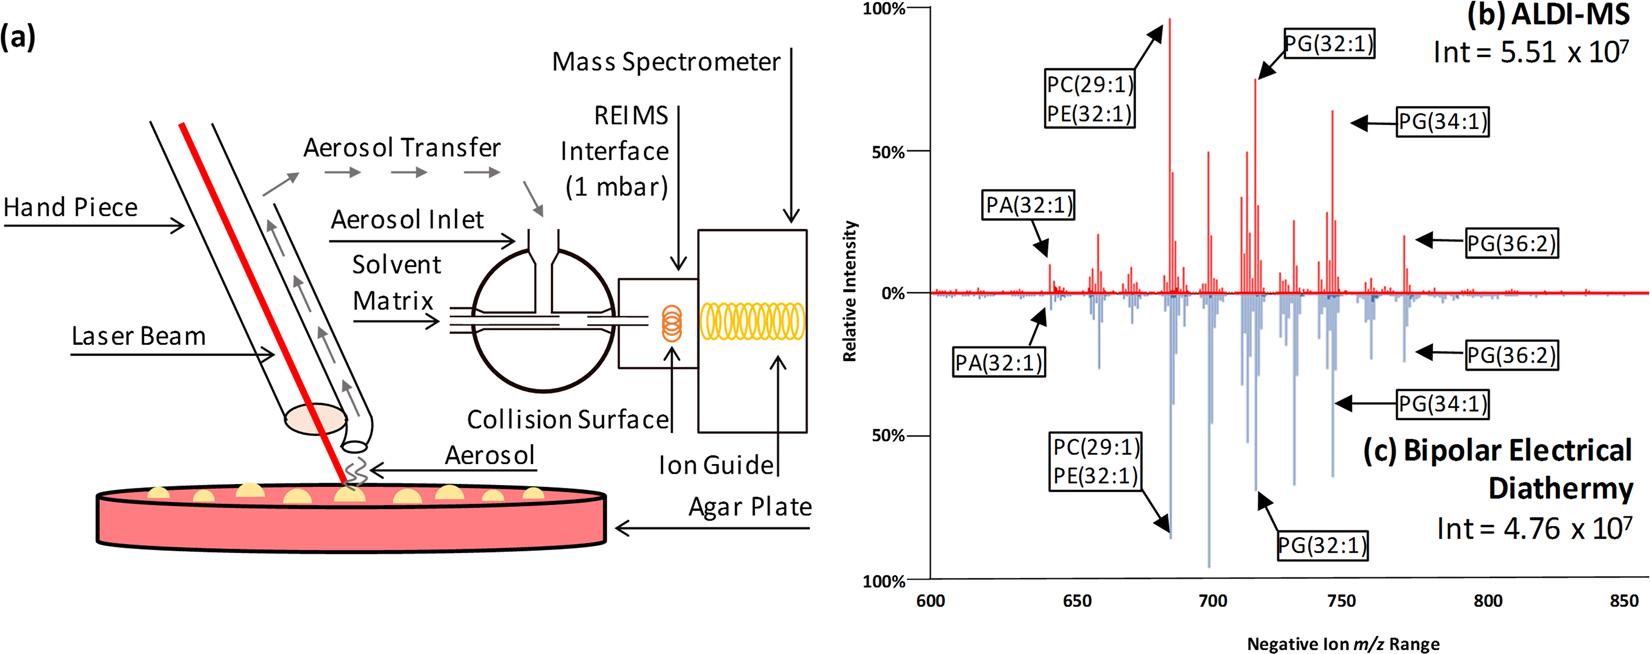 Utilisation of Ambient Laser Desorption Ionisation Mass Spectrometry